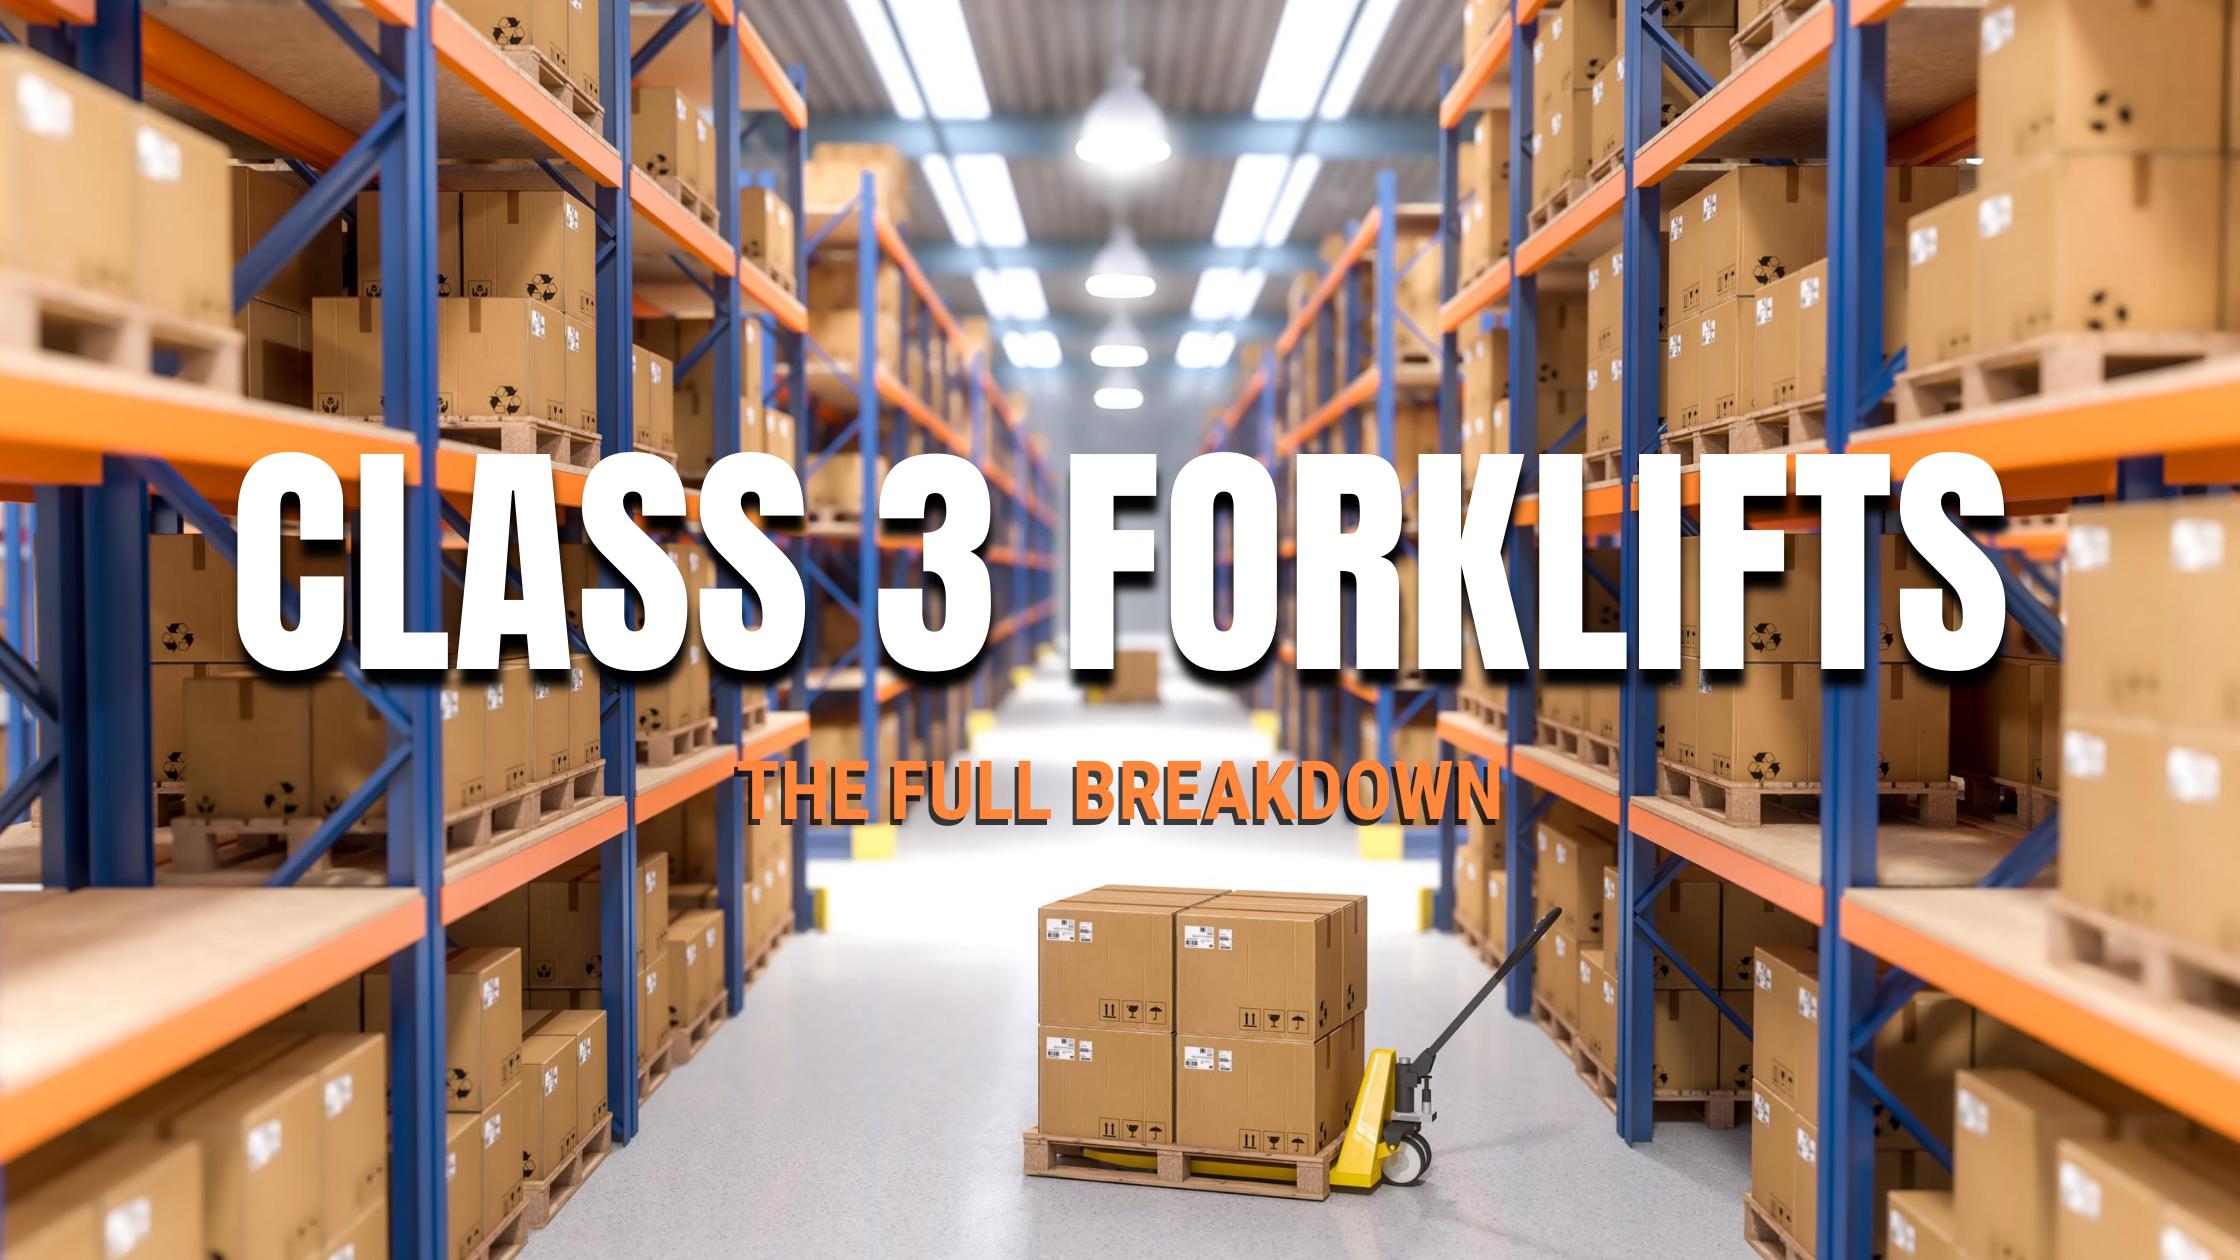 Class 3 Forklifts: The Full Breakdown